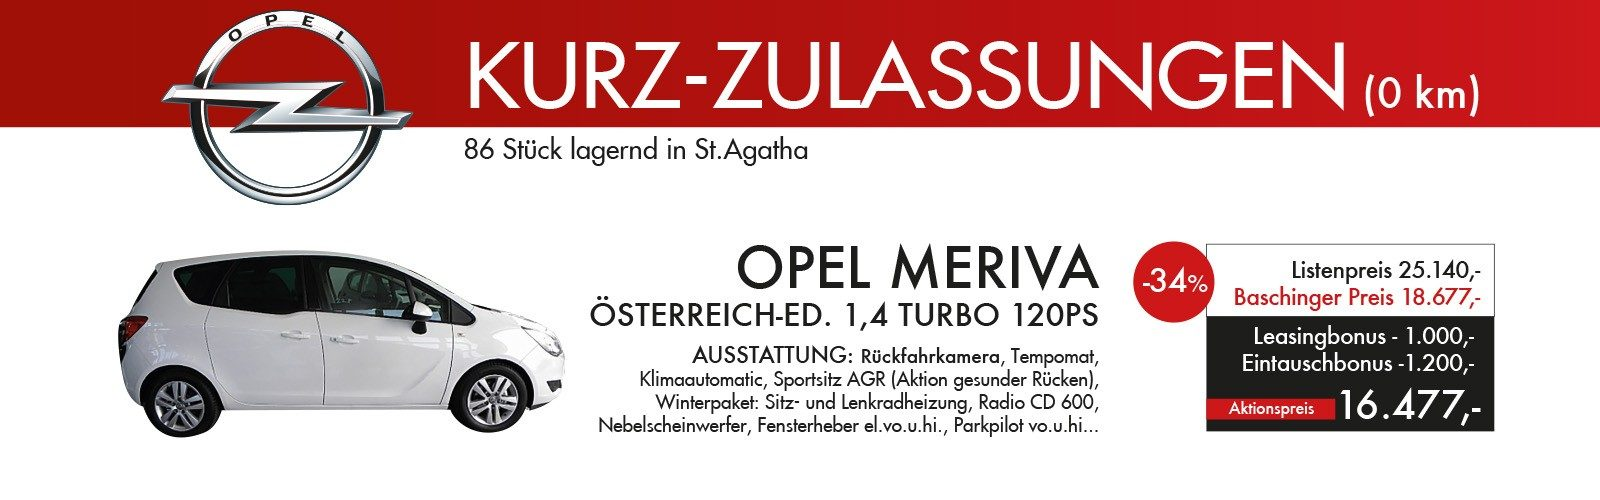 MERIVA bei Ing. Günther Baschinger GmbH in